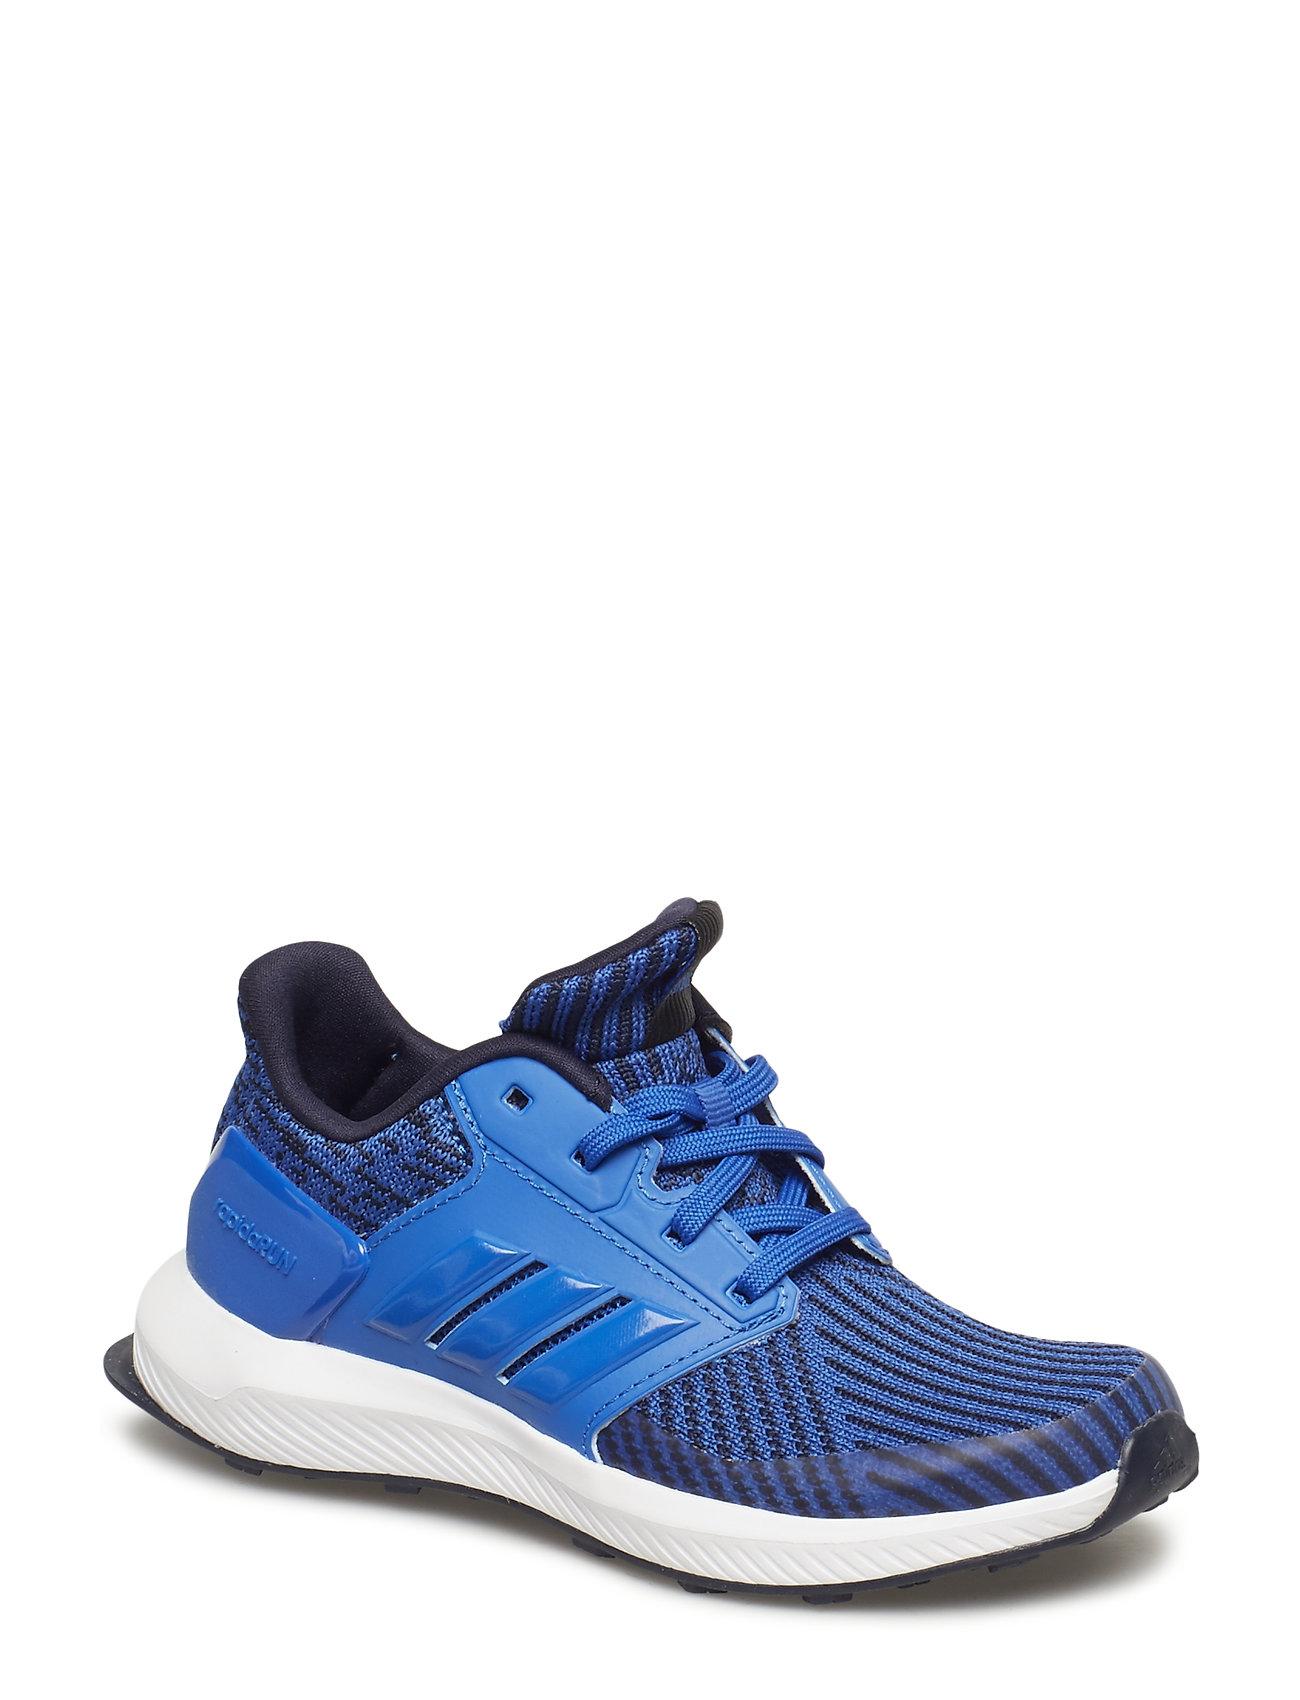 adidas Performance RapidaRun KNIT C - BLUE/LEGINK/FTWWHT